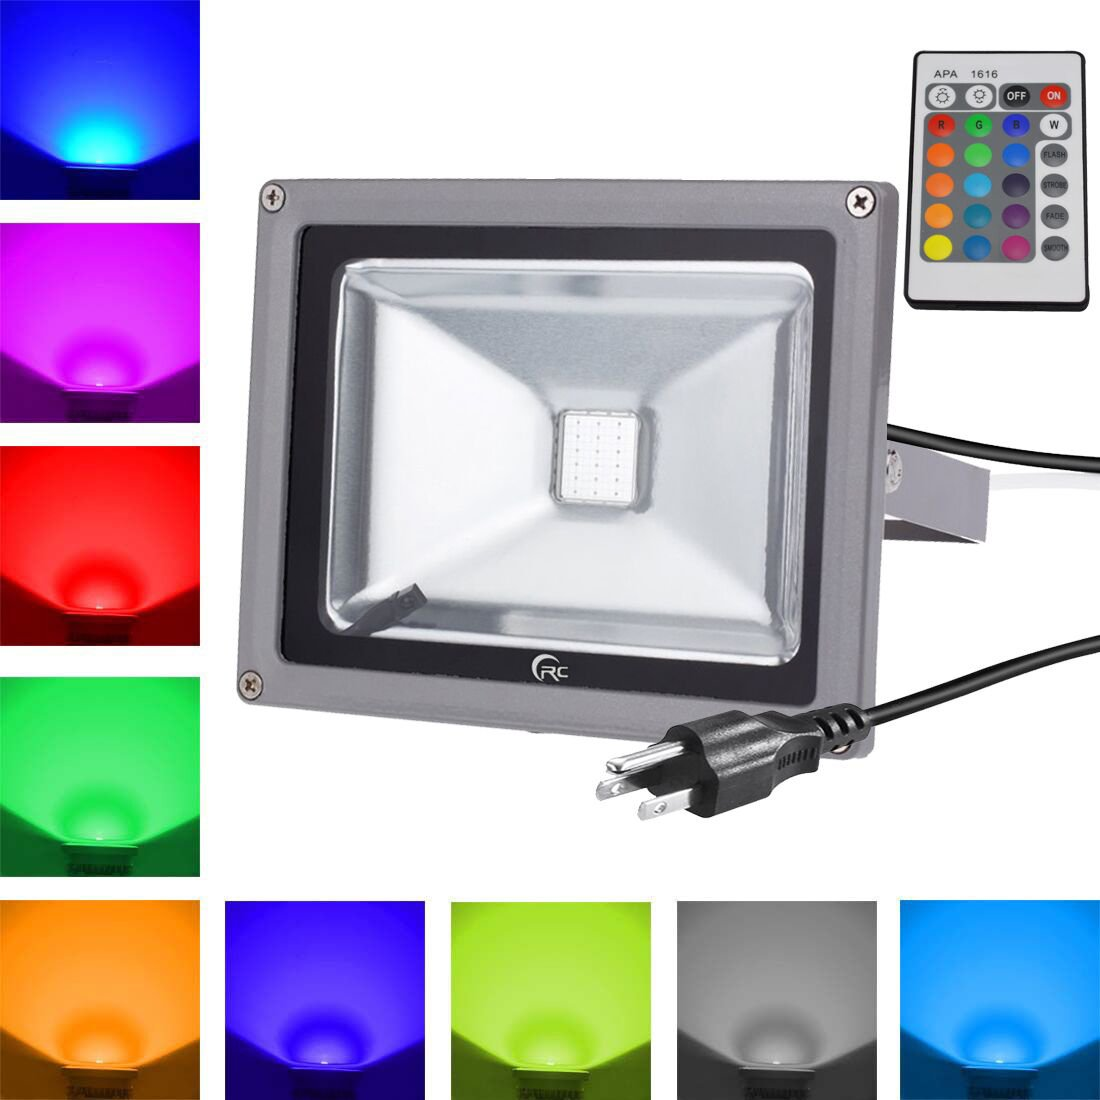 RC 20W Waterproof RGB LED Flood Light with 24Key IR Remote and US 3-Plug